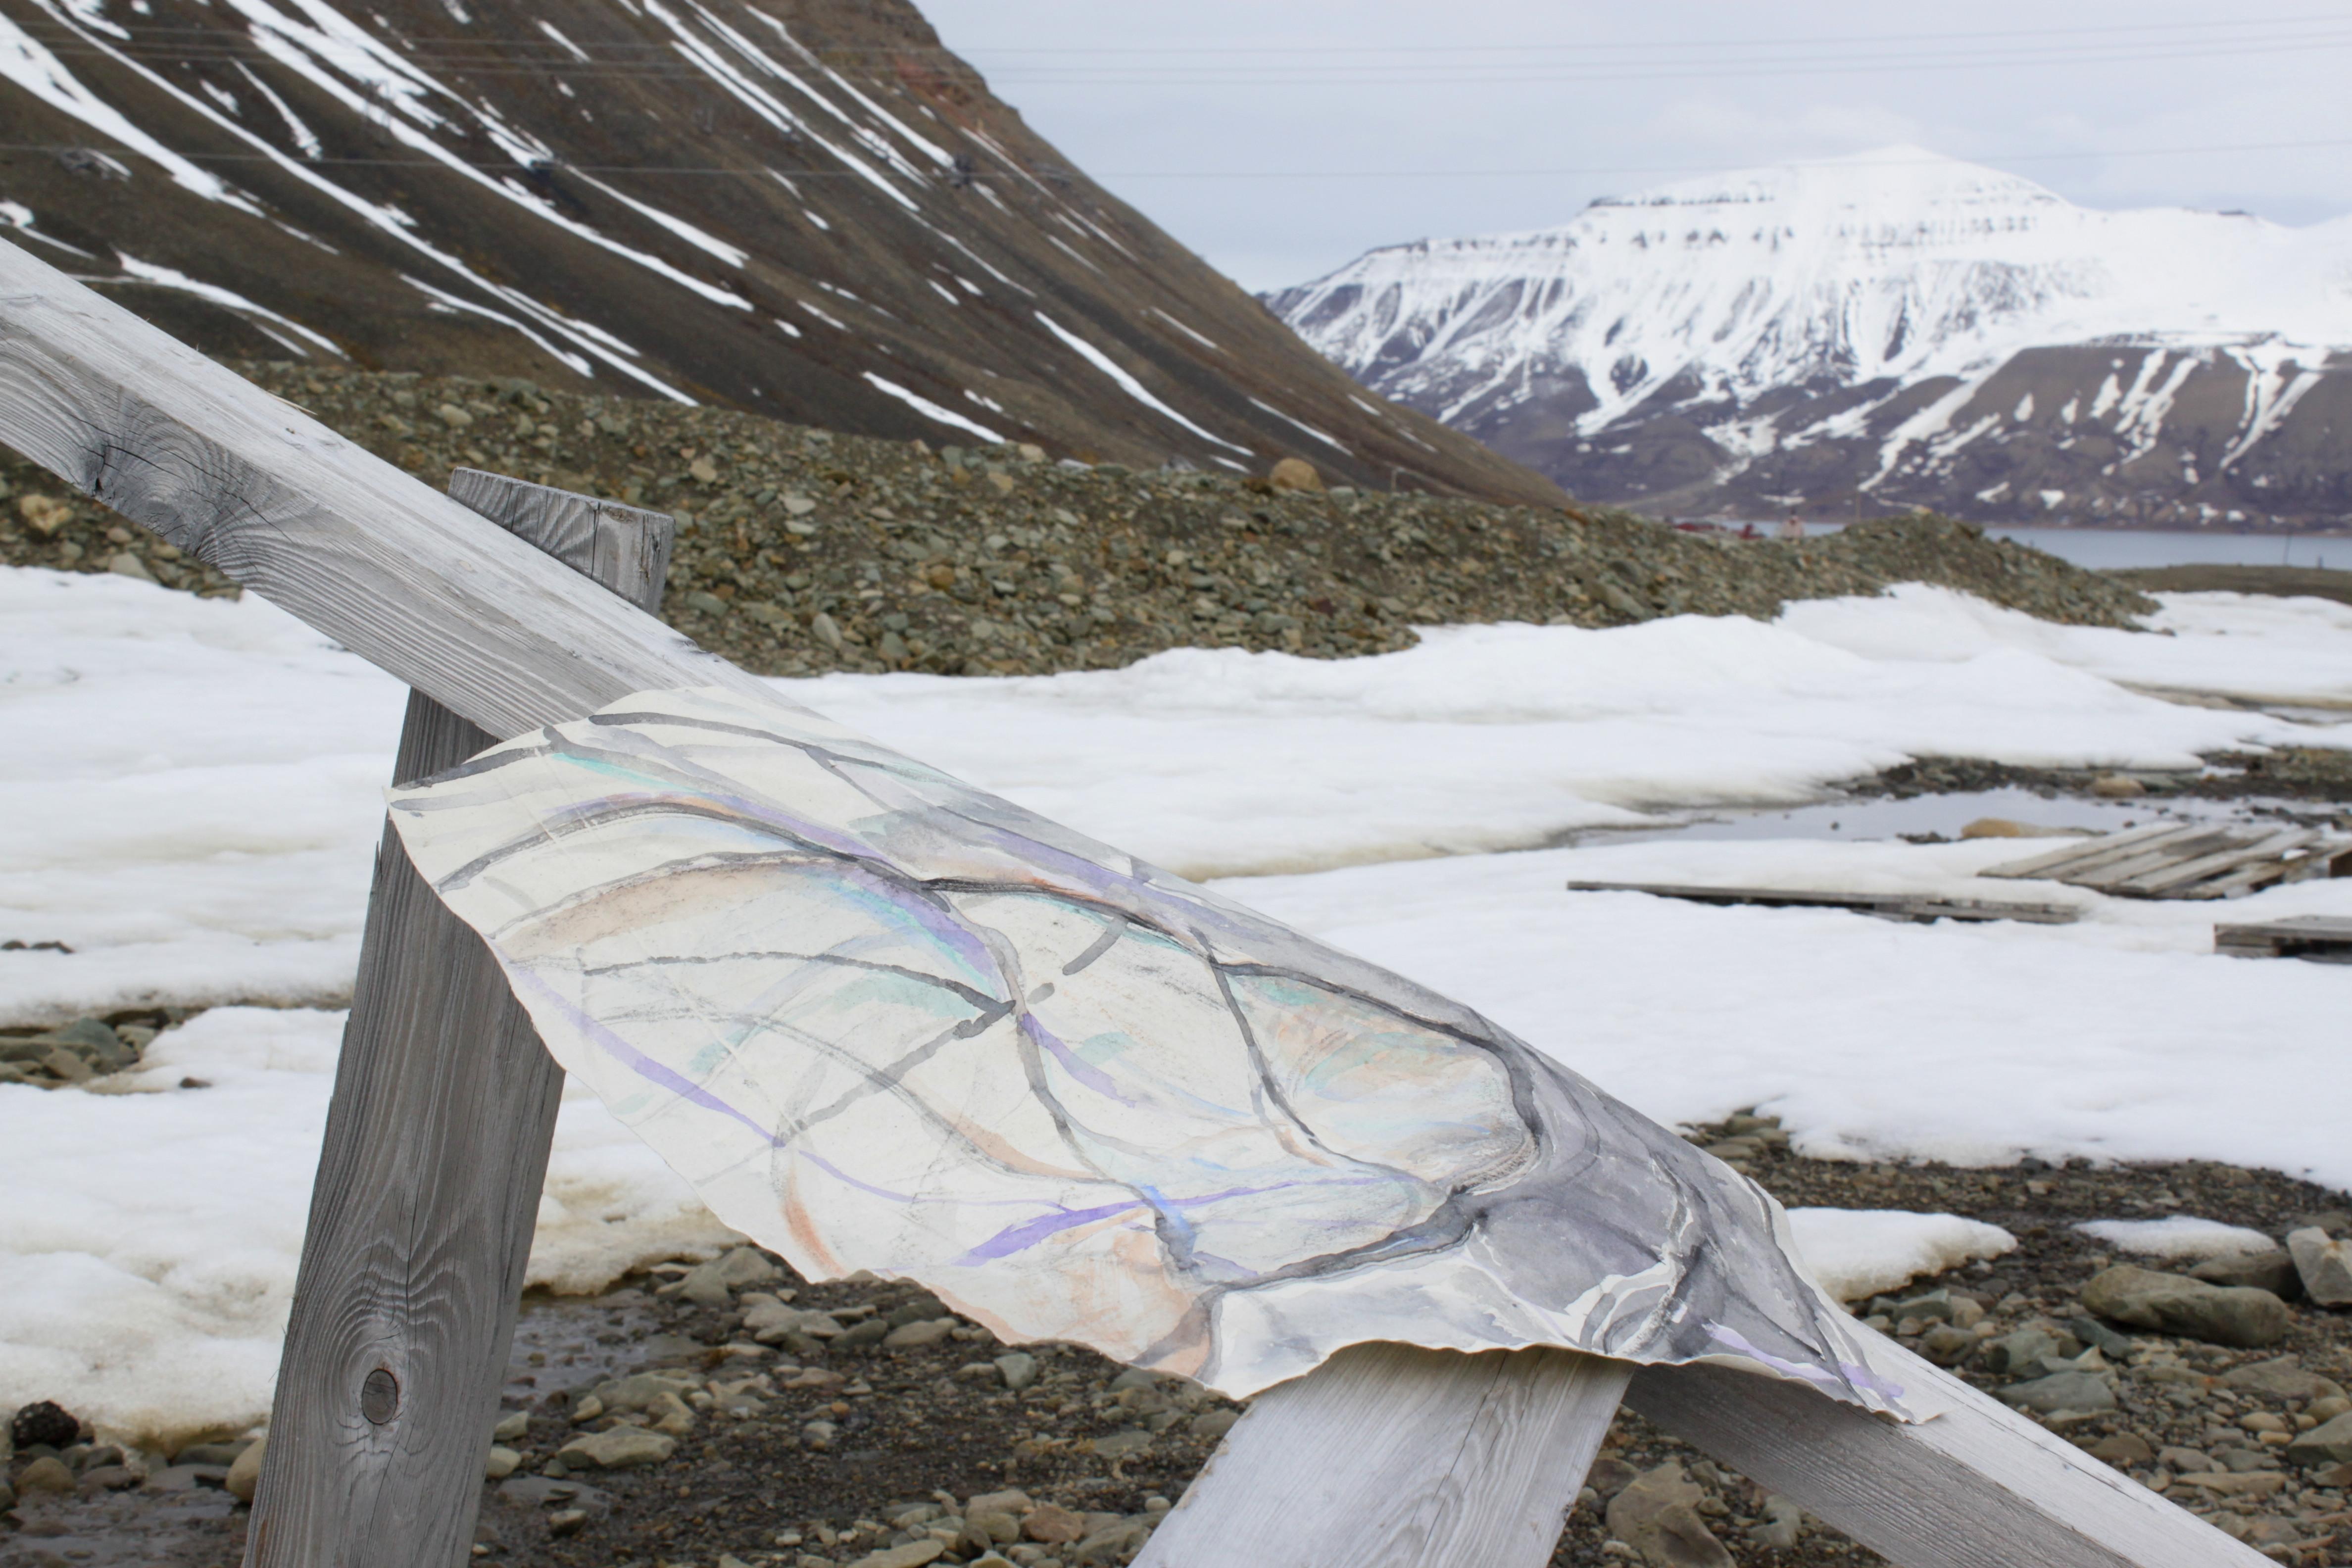 Linda Hemmersbach, Painting experiment in Svalbard, 2018